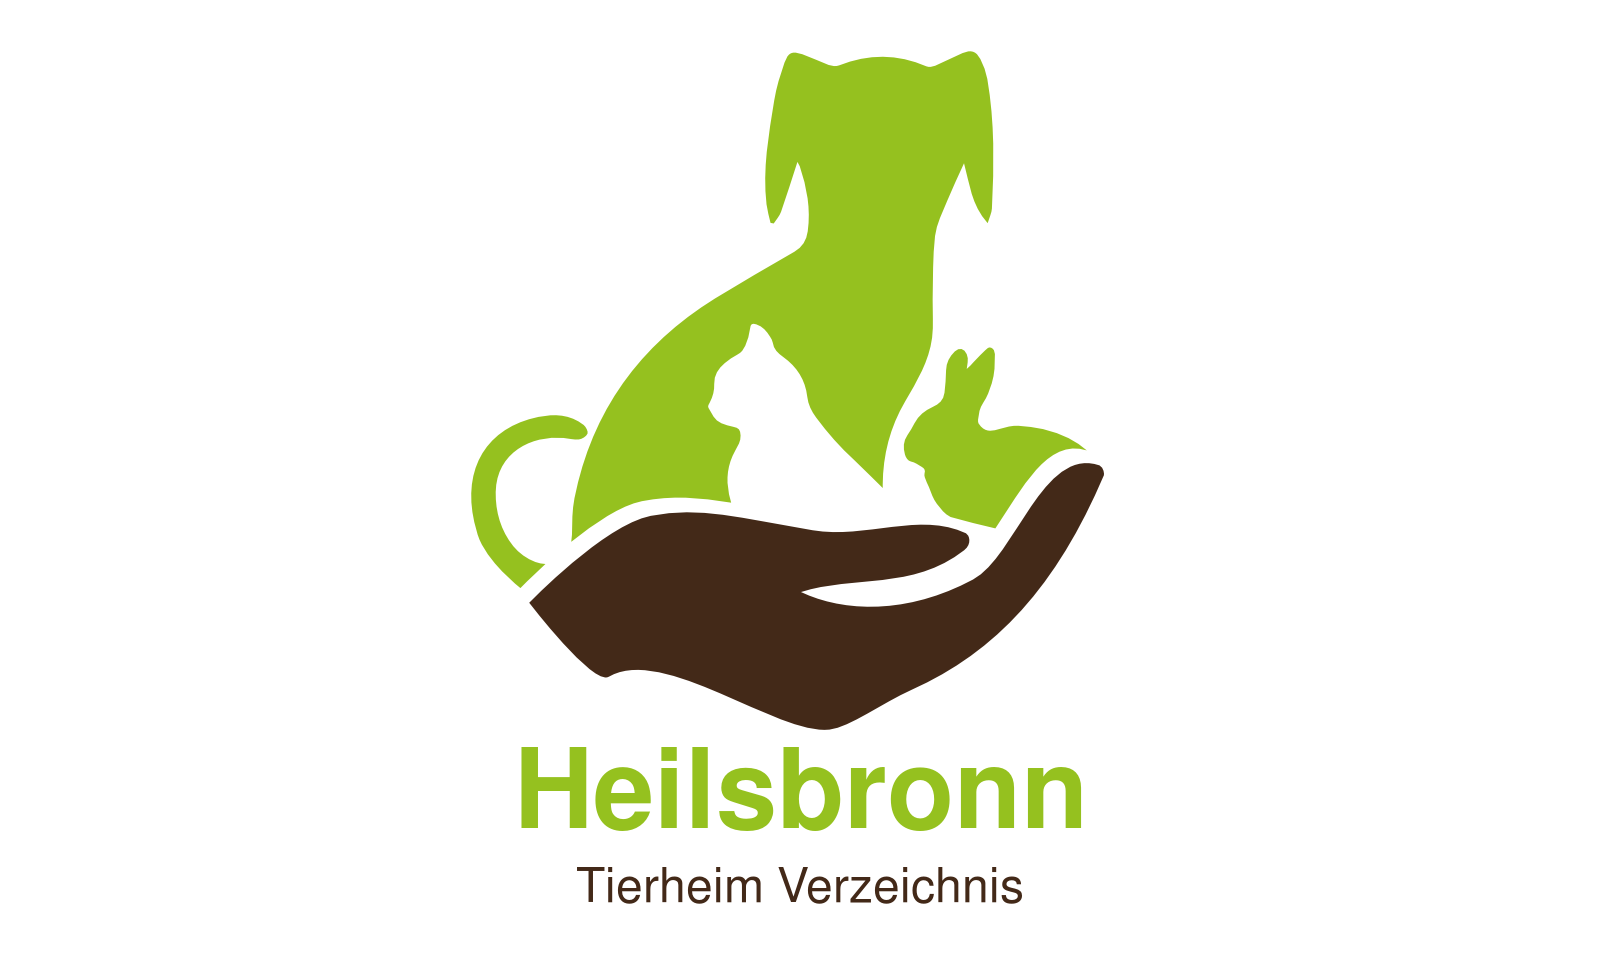 Tierheim Heilsbronn